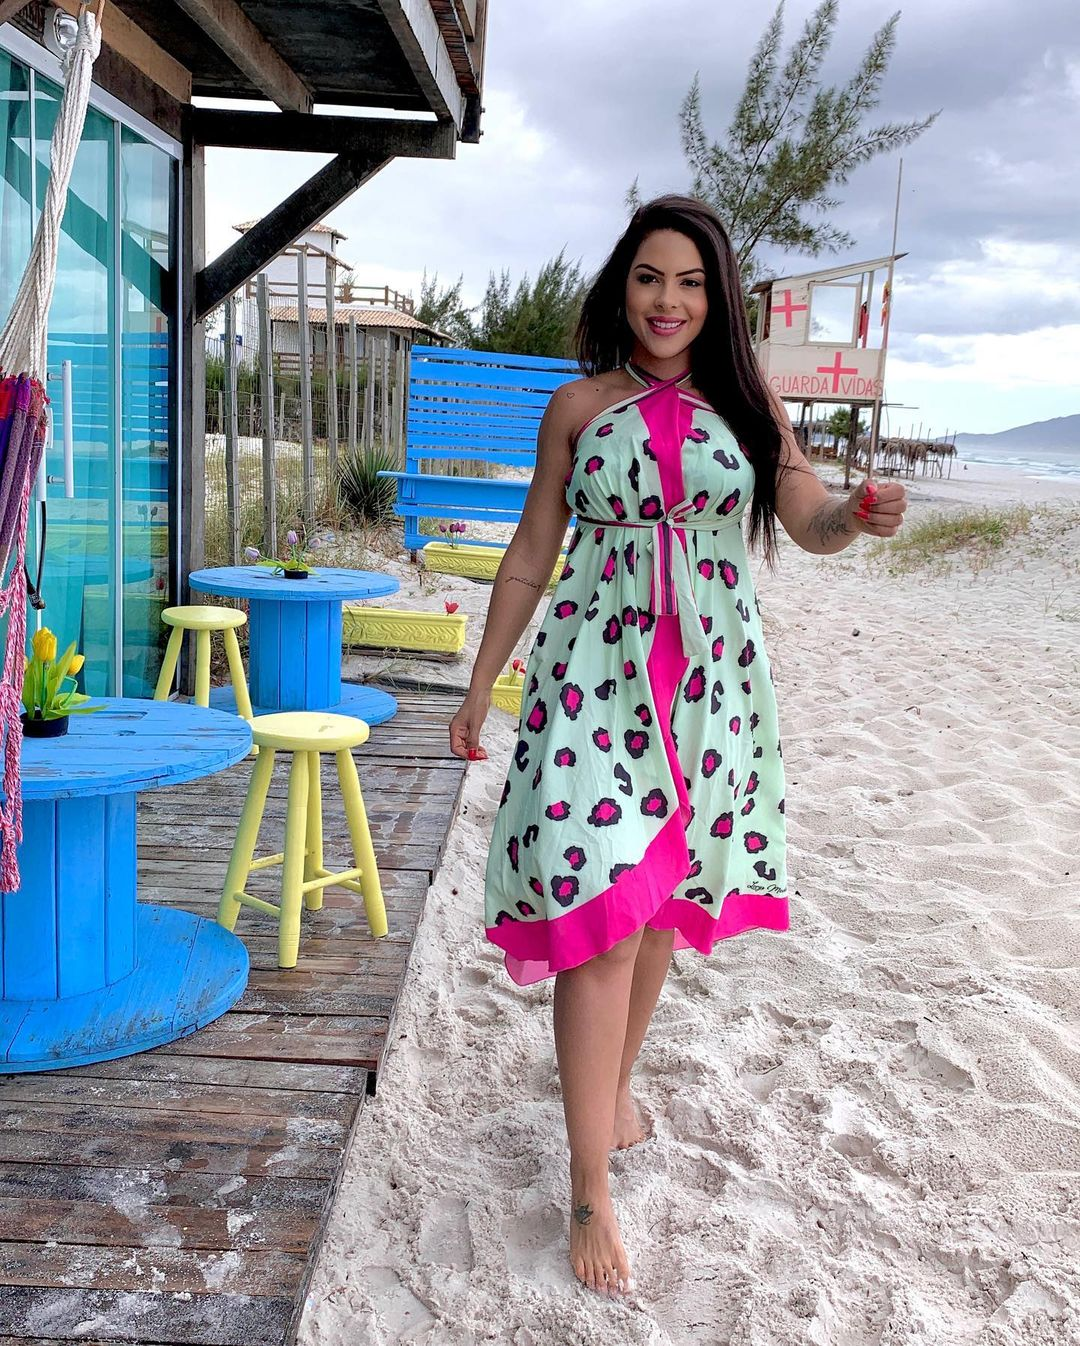 Adriana-Santiago-Wallpapers-Insta-Fit-Bio-2